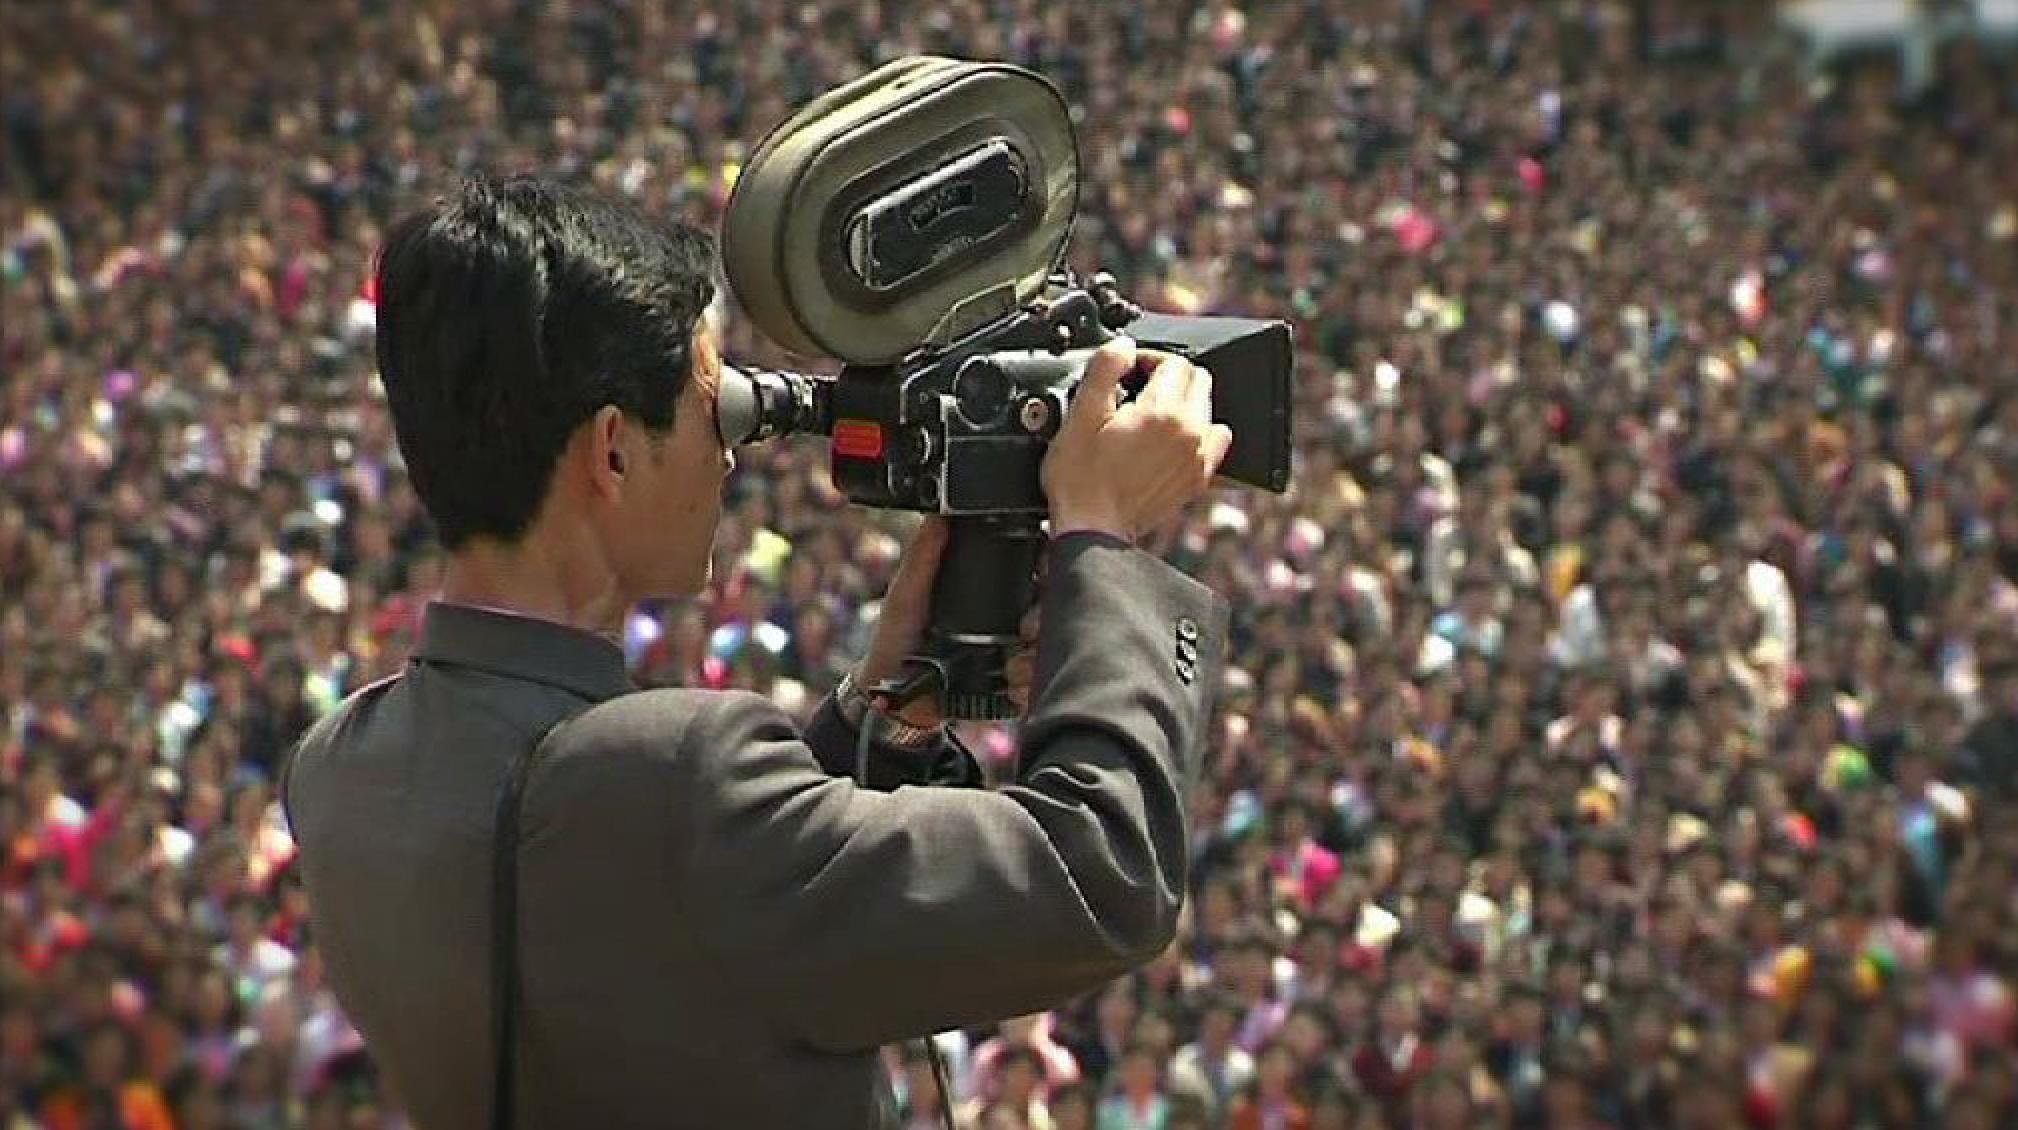 North Korea Videoblog Part 1